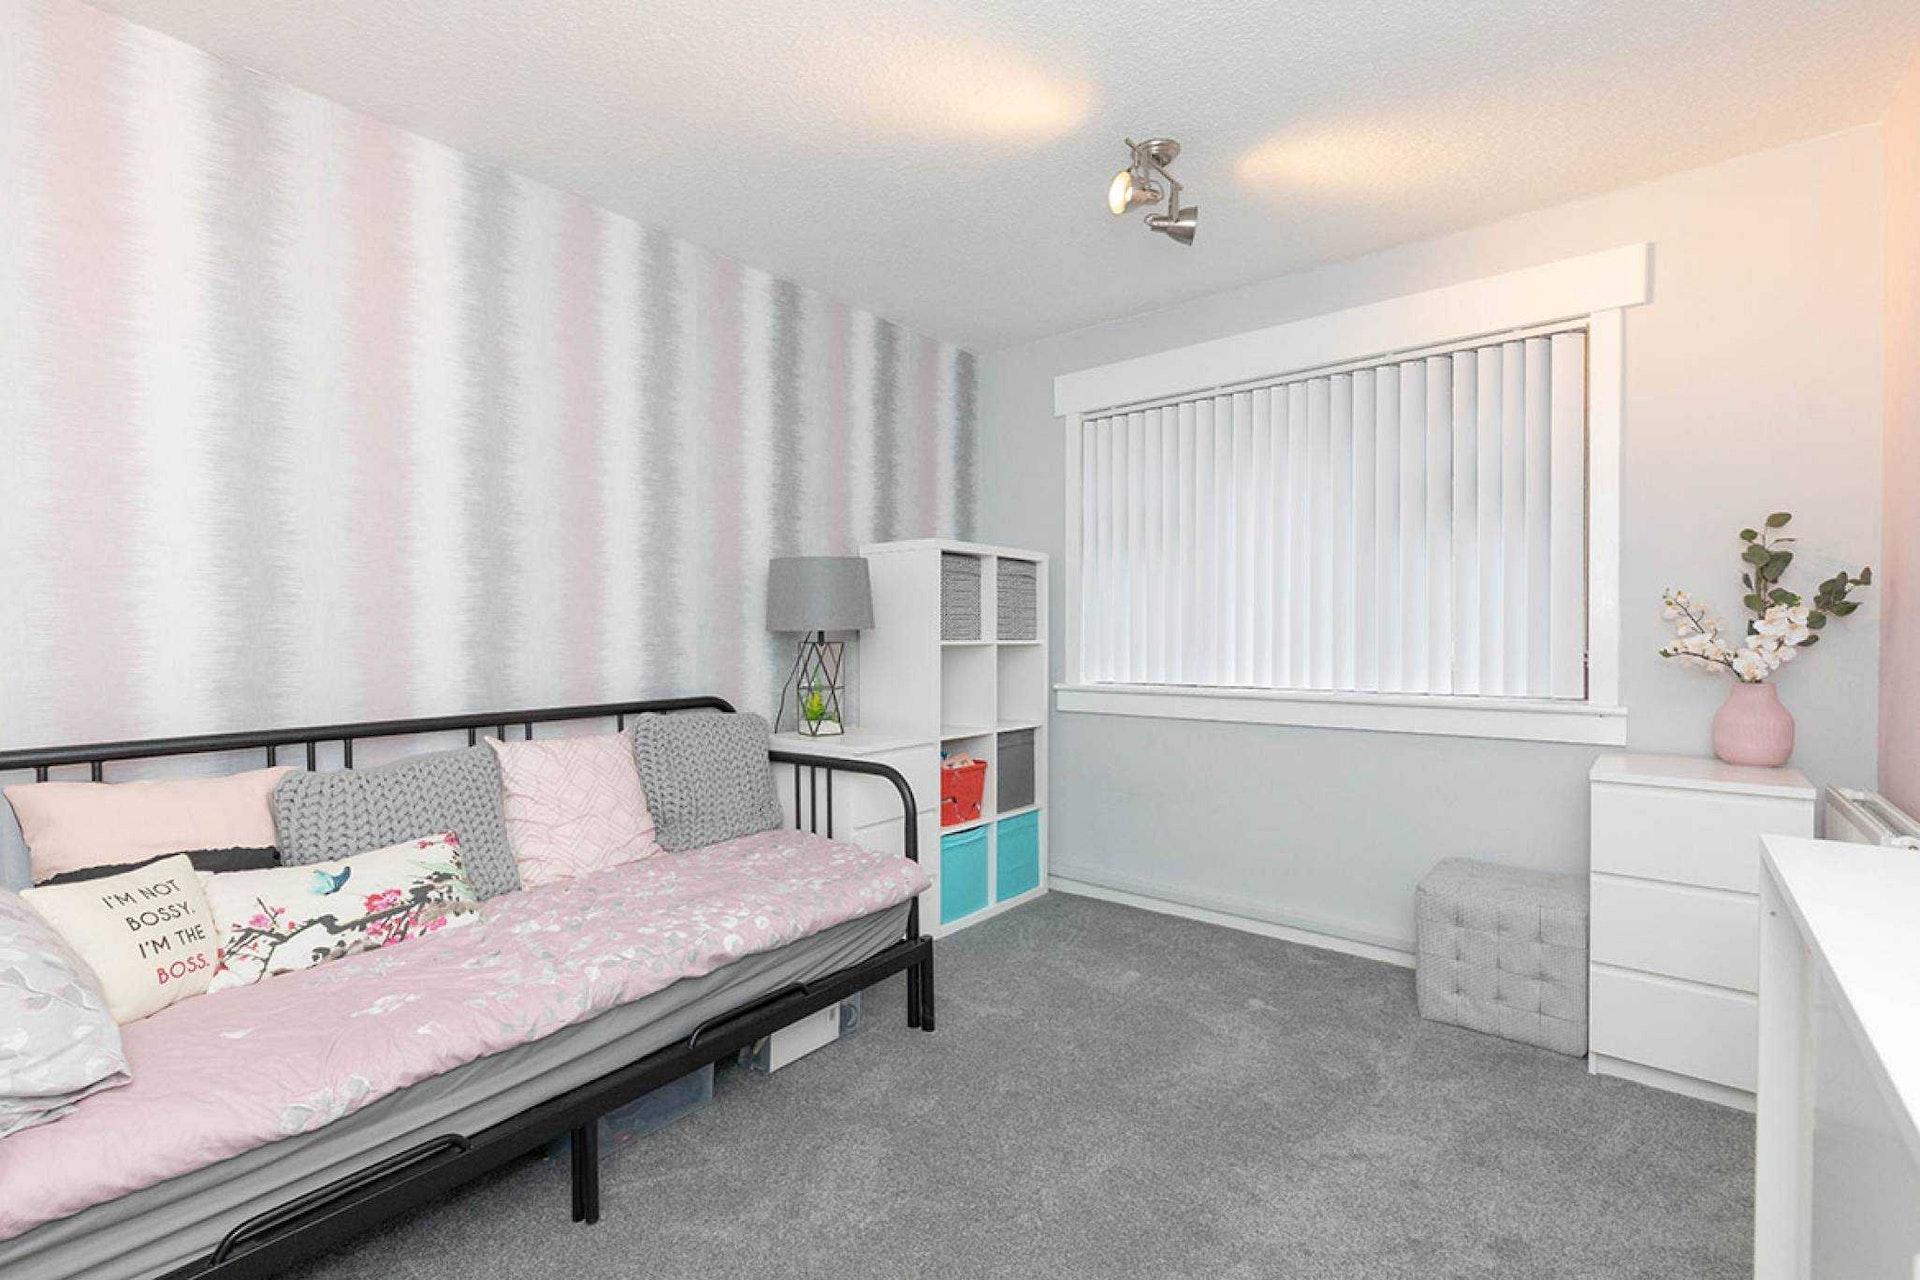 5b Moir Terrace, , Musselburgh, EH21 8JG | McEwan Fraser Legal